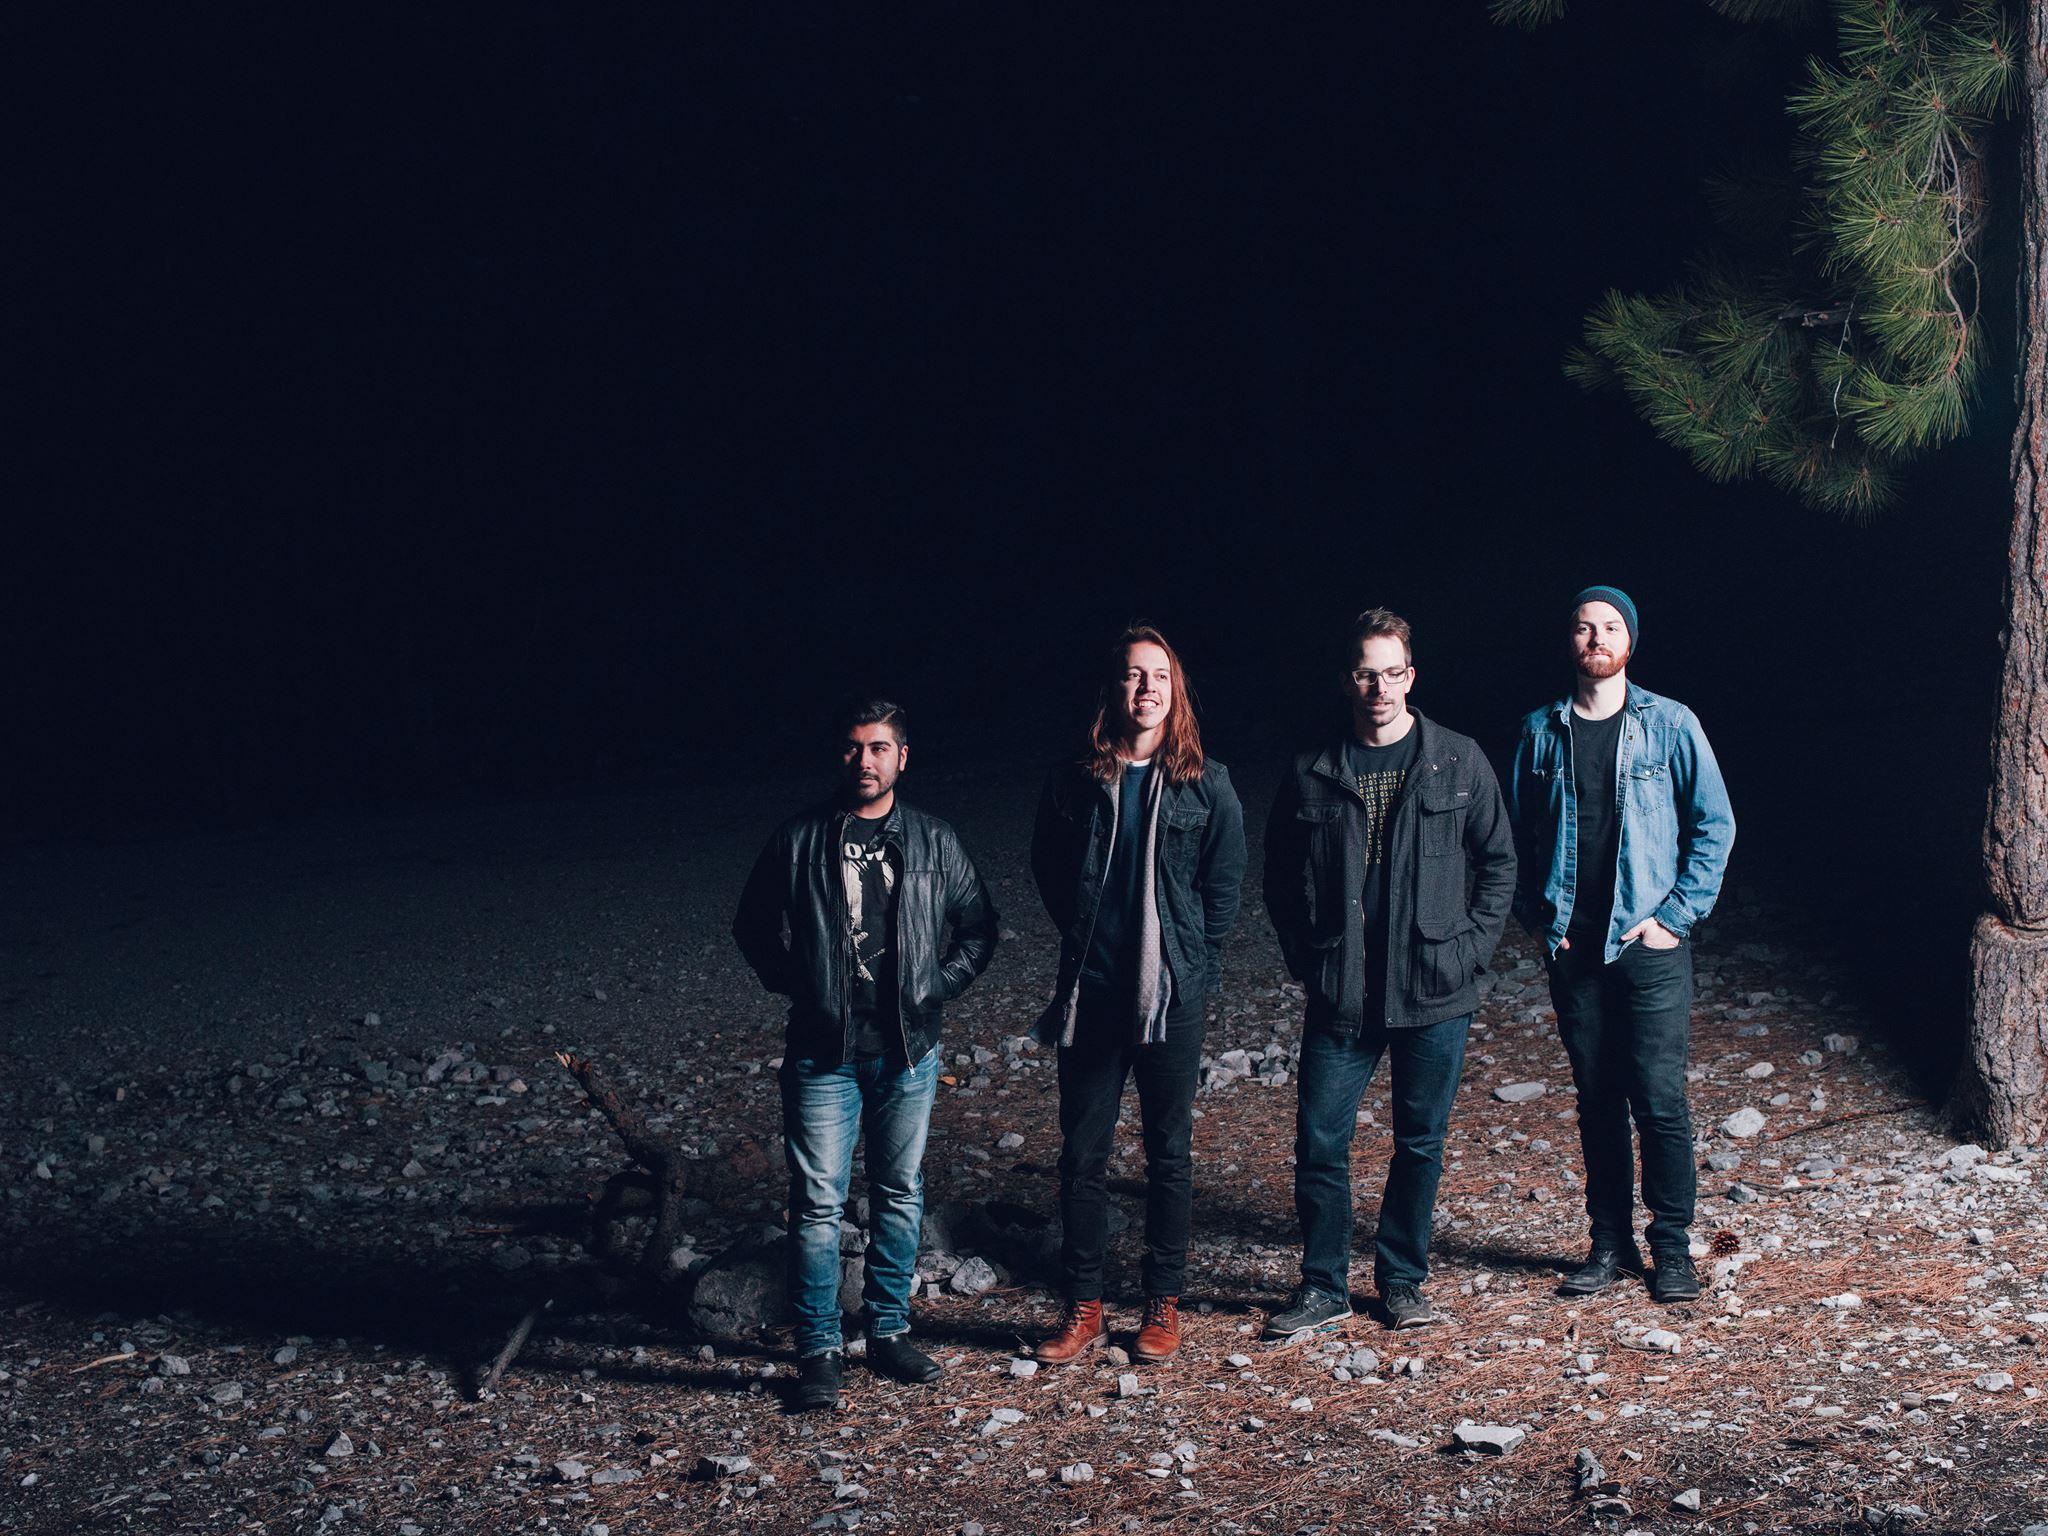 OWildly is a rock band based in Las Vegas. Members include Adam Christopher Smith,Carlos Vargas,Charlie Gott, and Mycah Krason.Instagram: @owildly Twitter: @owildlymusic